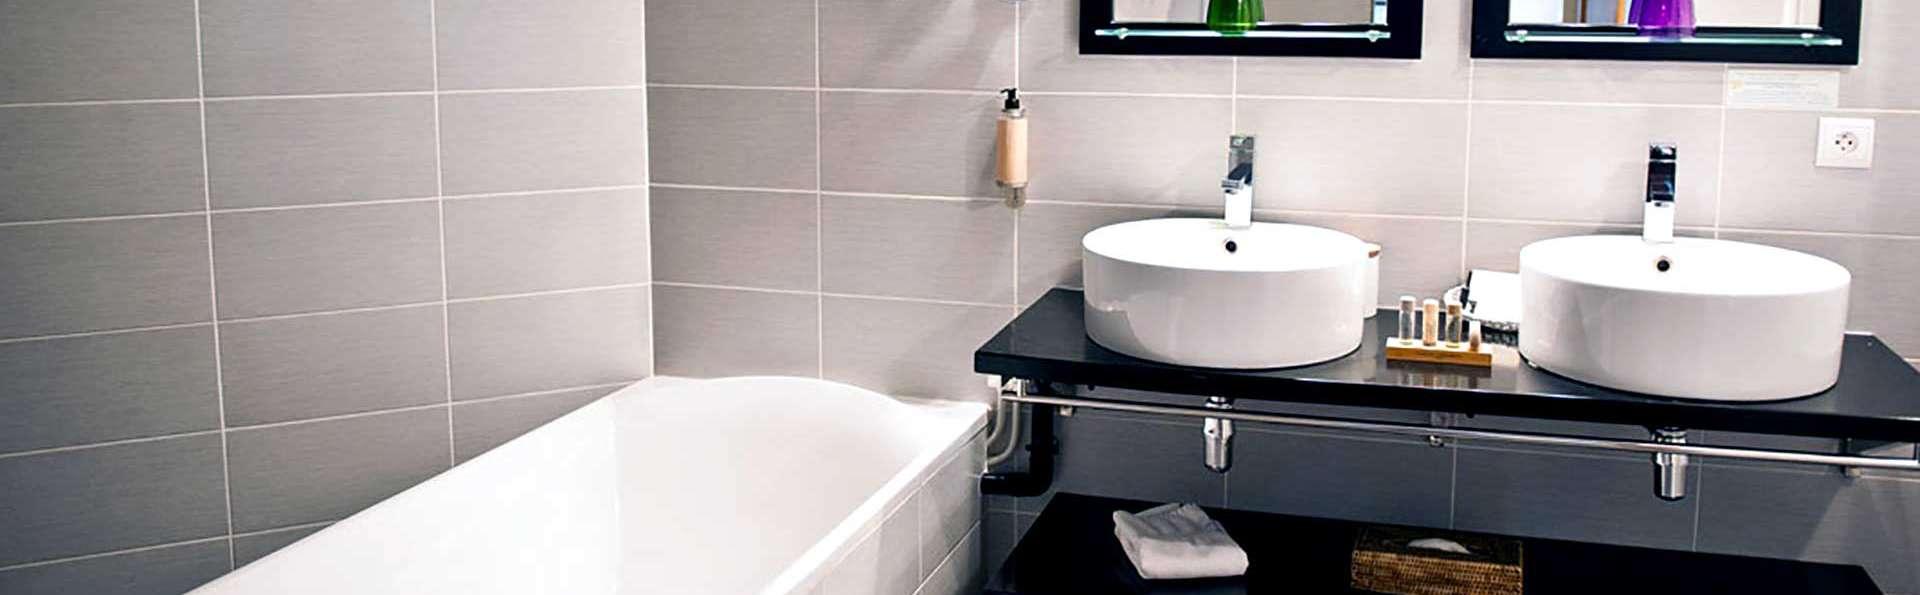 Domaine de Barive - Edit_Bathroom.jpg